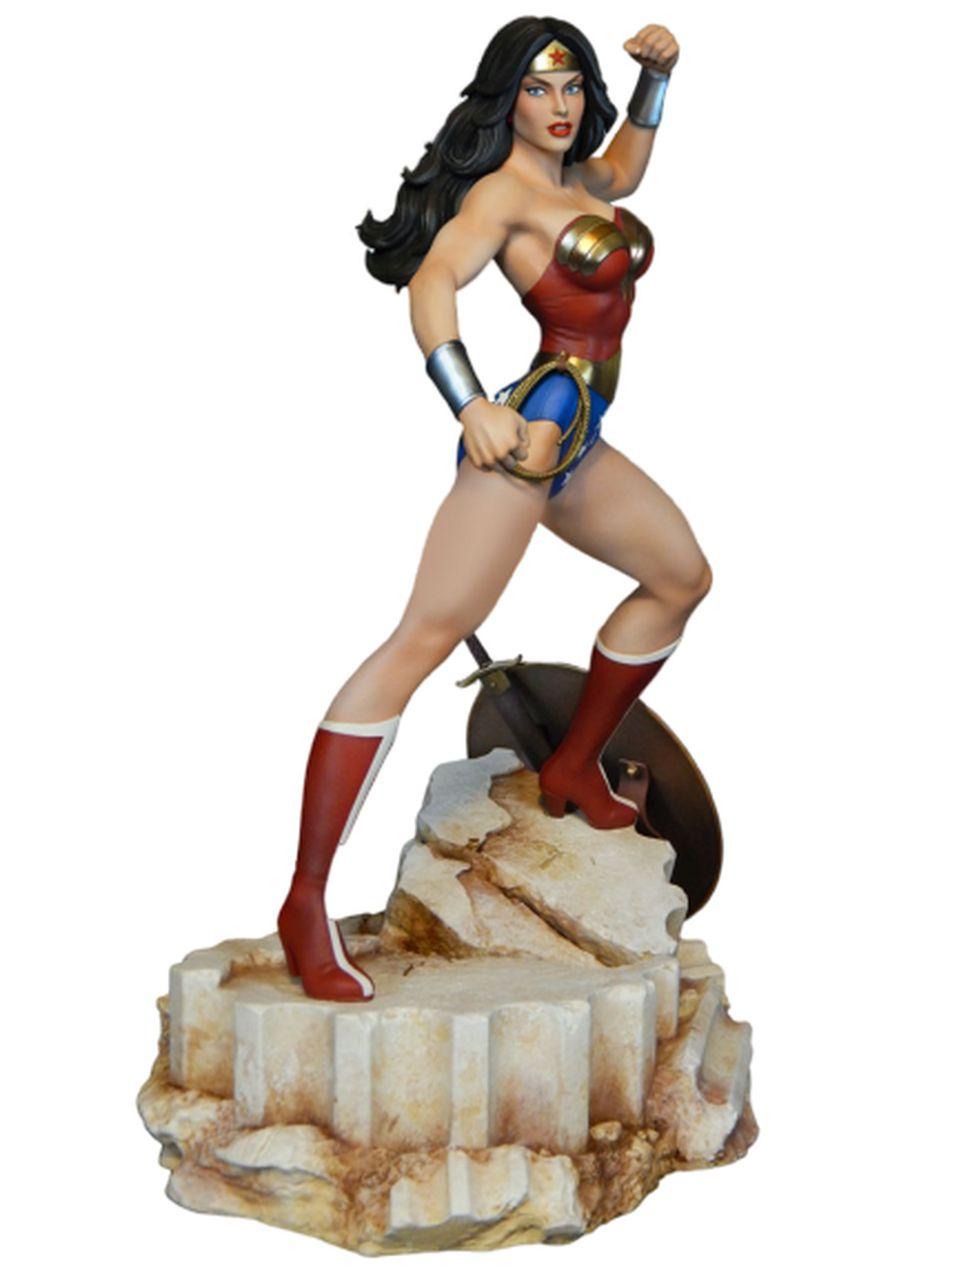 Estátua Mulher-Maravilha (Wonder Woman)  Super Powers Maquette - Tweeterhead (Apenas Venda Online)